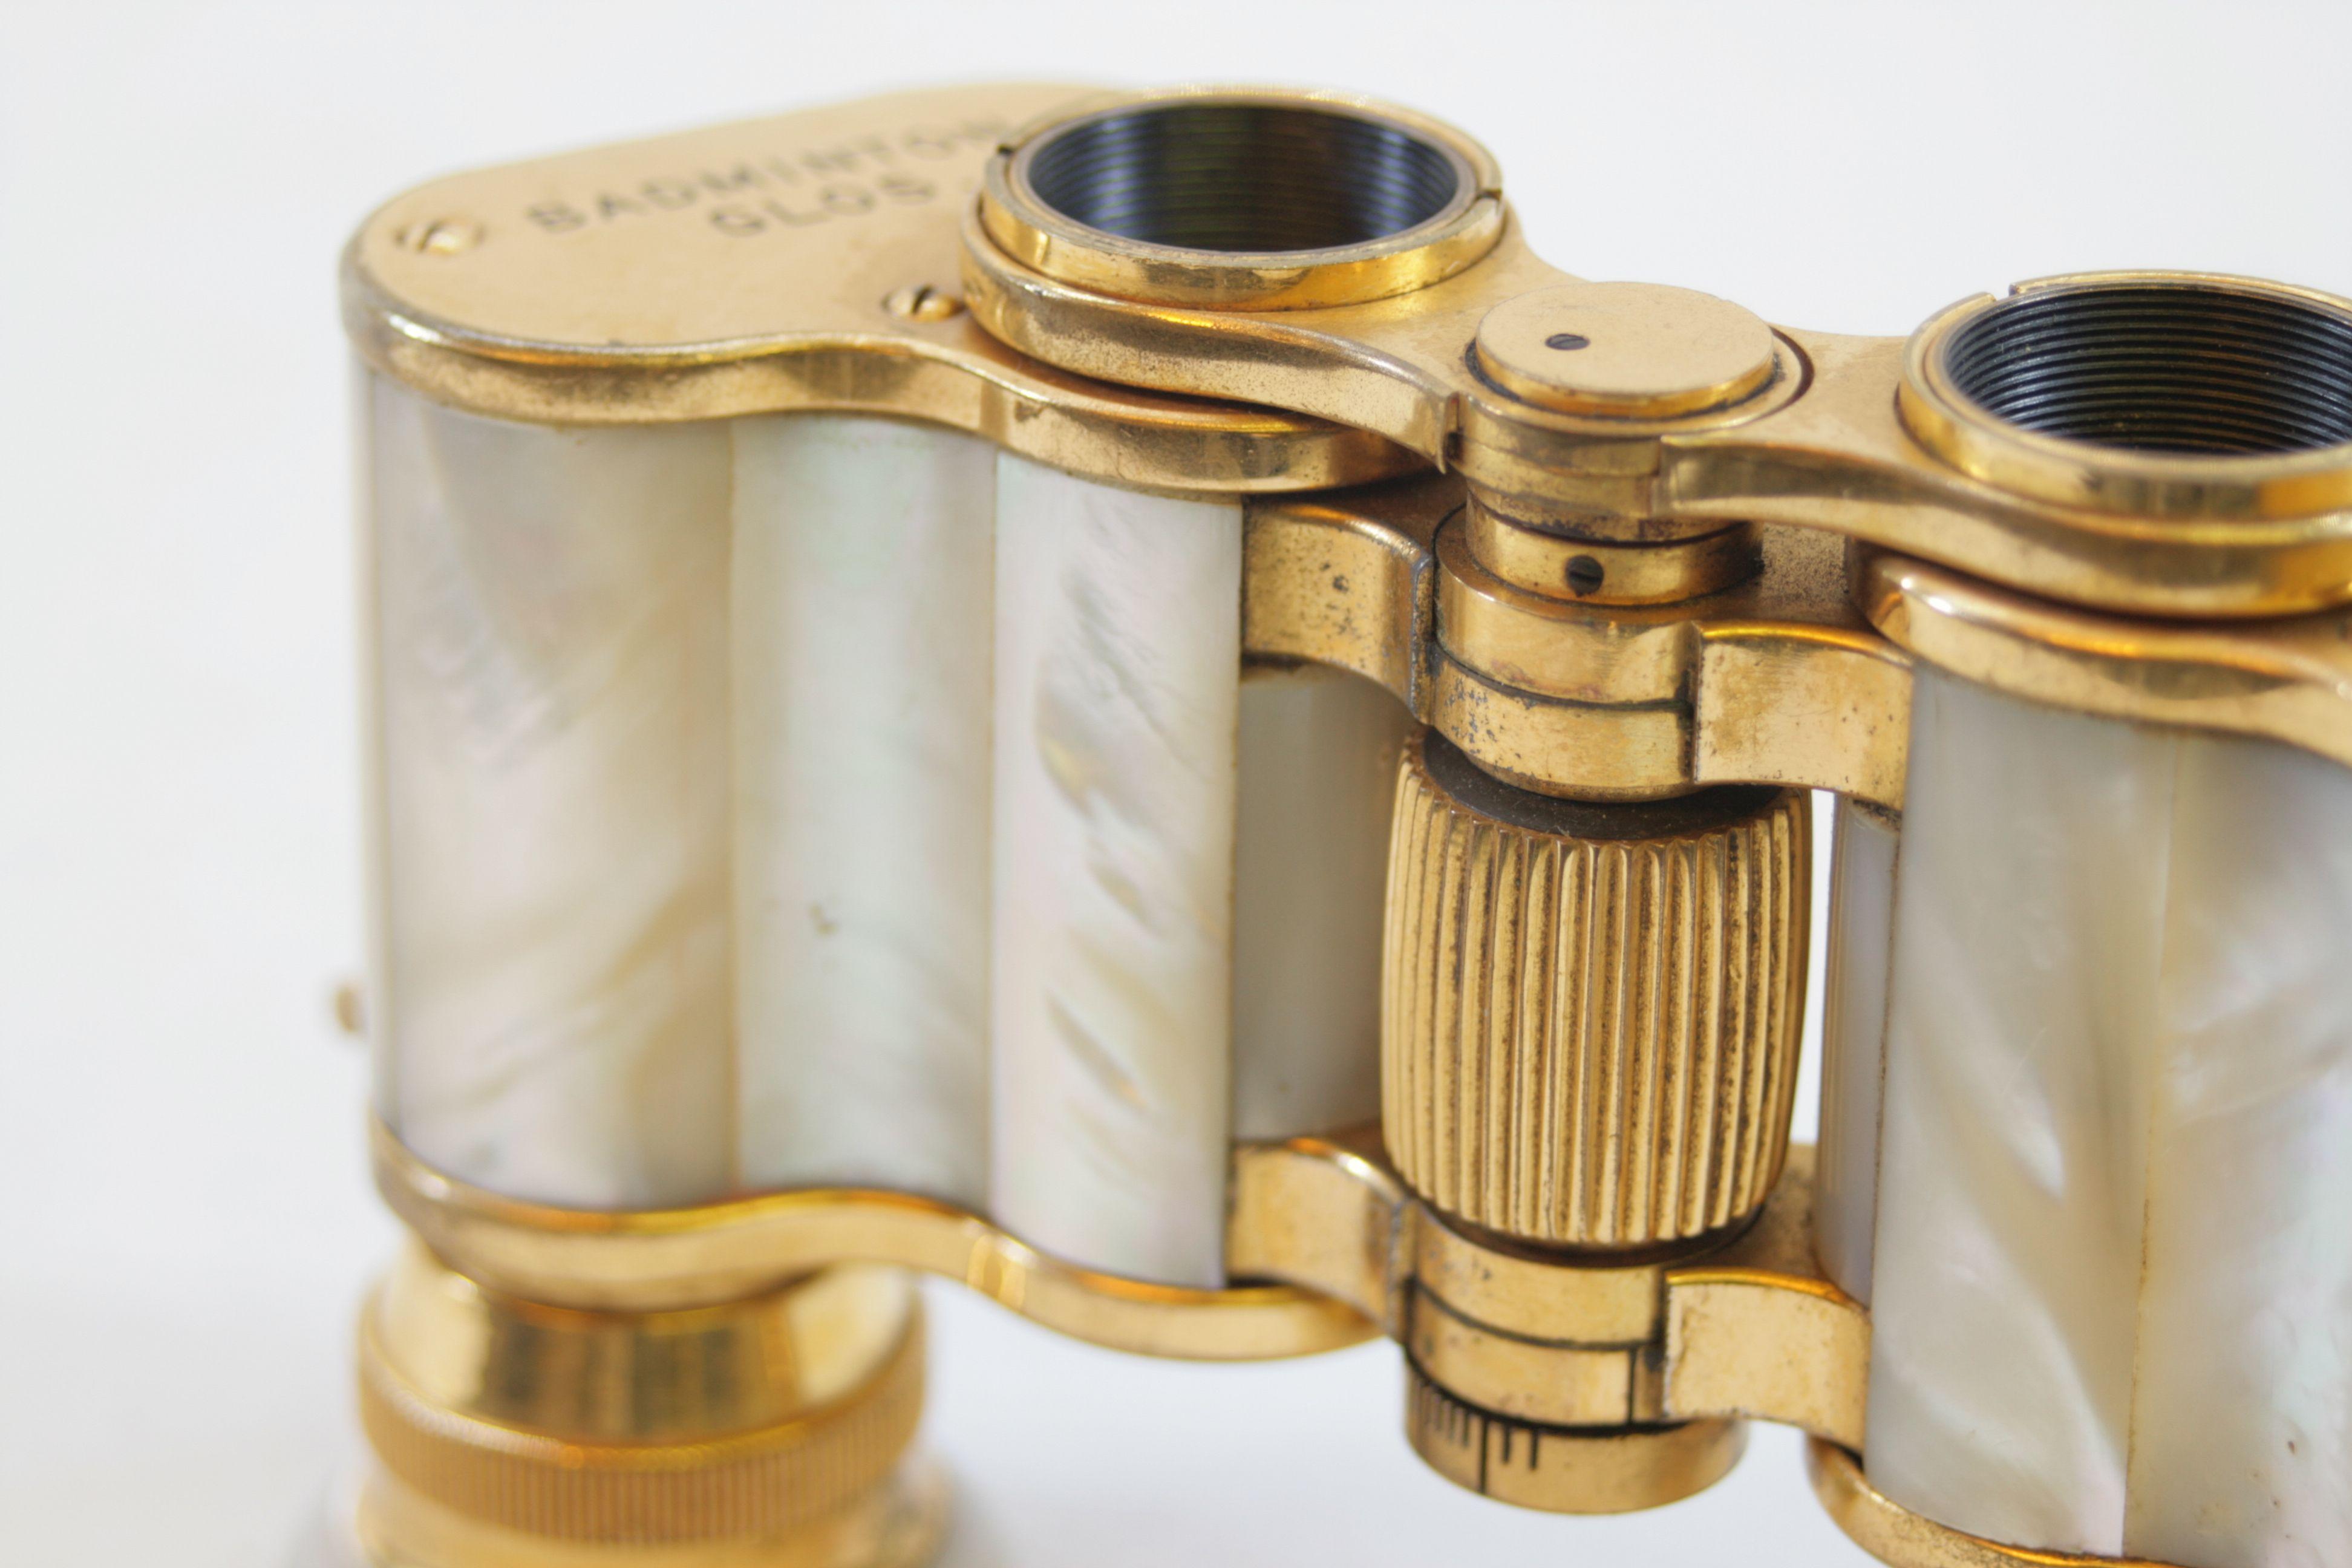 61d31136818 Open Full-Size Image. Carl Zeiss Jena Teleater 3 x 13.5 Prismatic Pearl  Opera Glasses   Binoculars 11